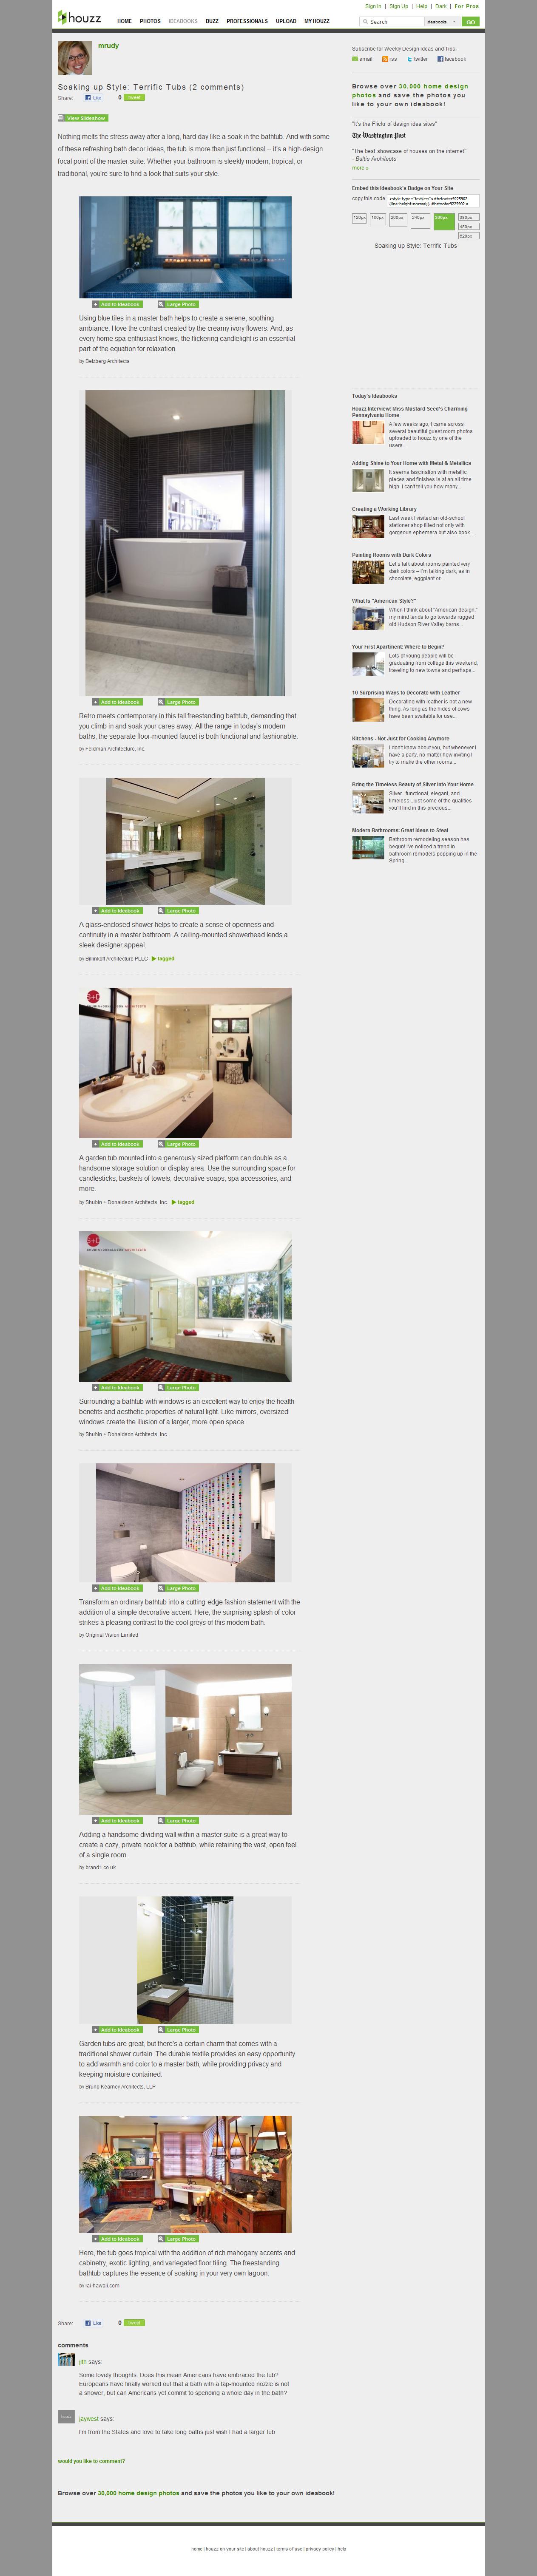 Home Decor Article: Terrific Tubs